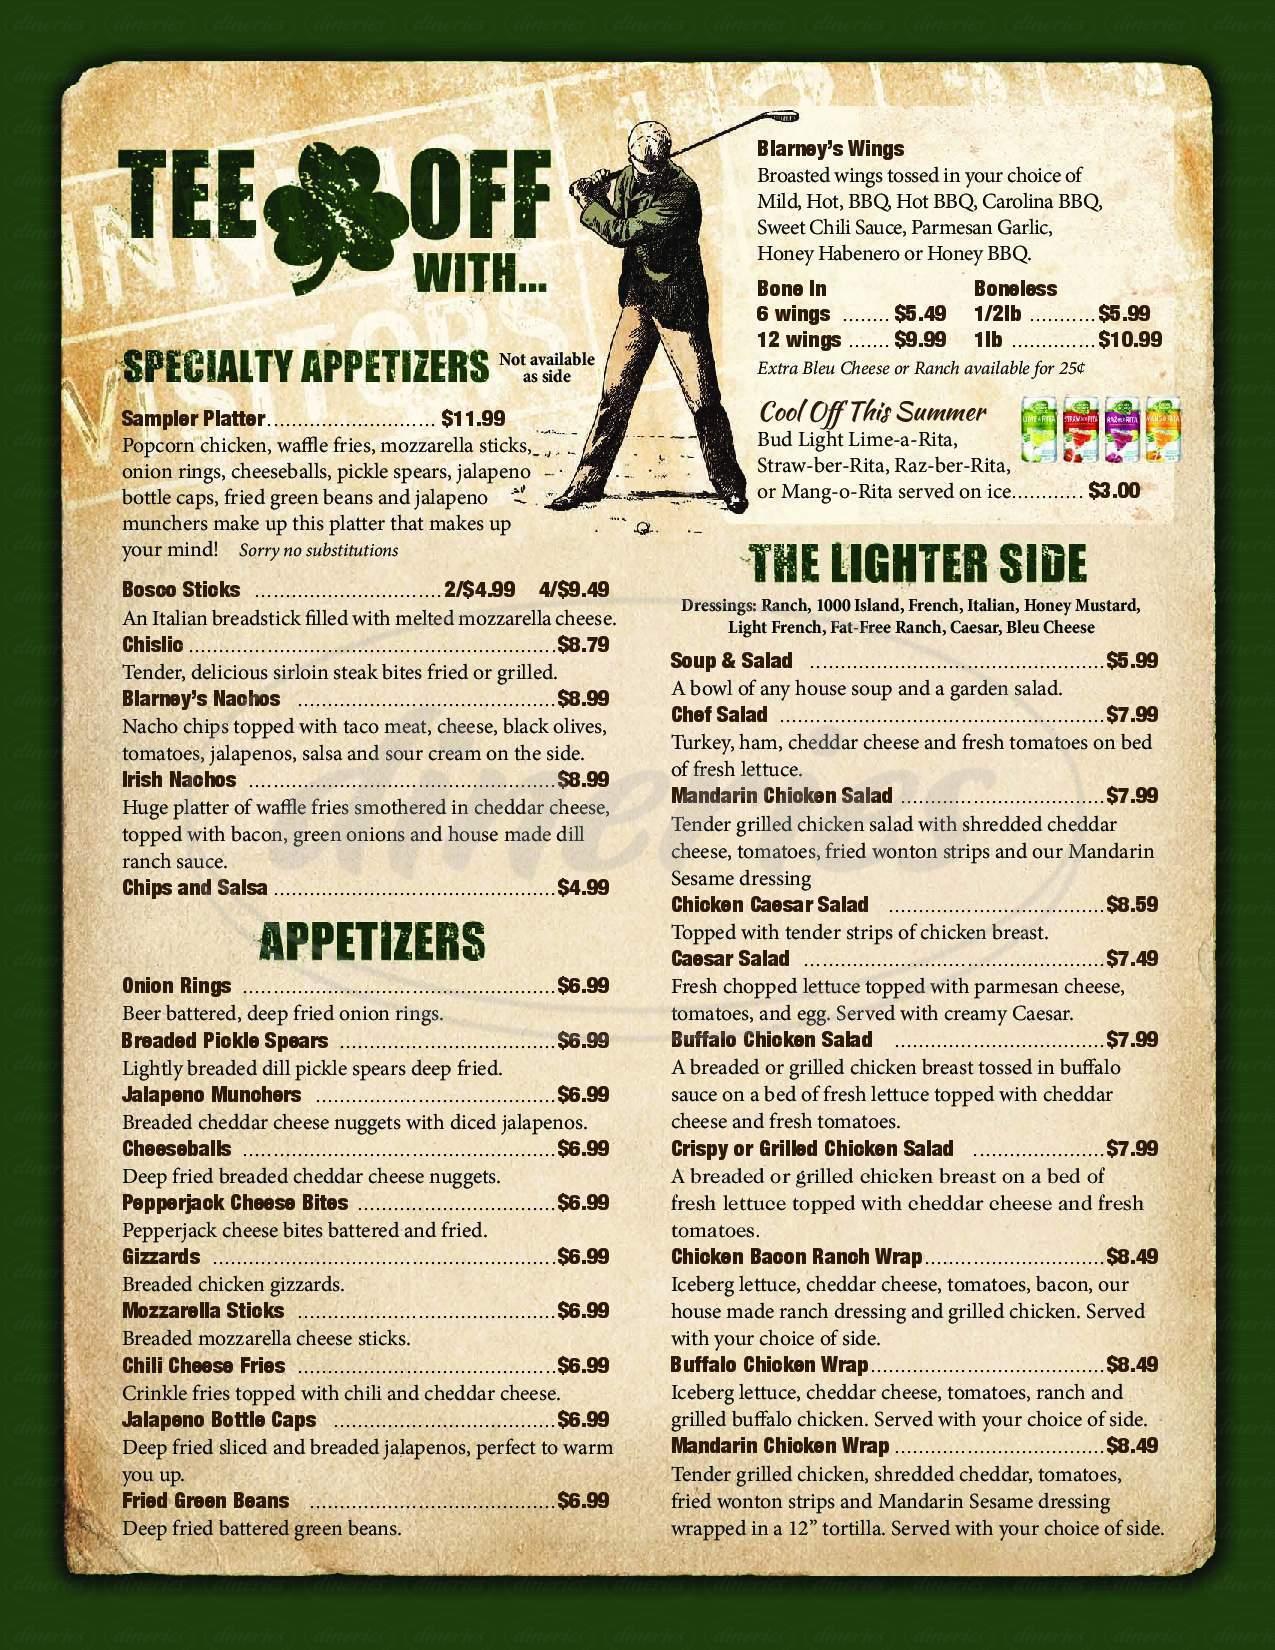 menu for Blarney's Sportsbar and Grill